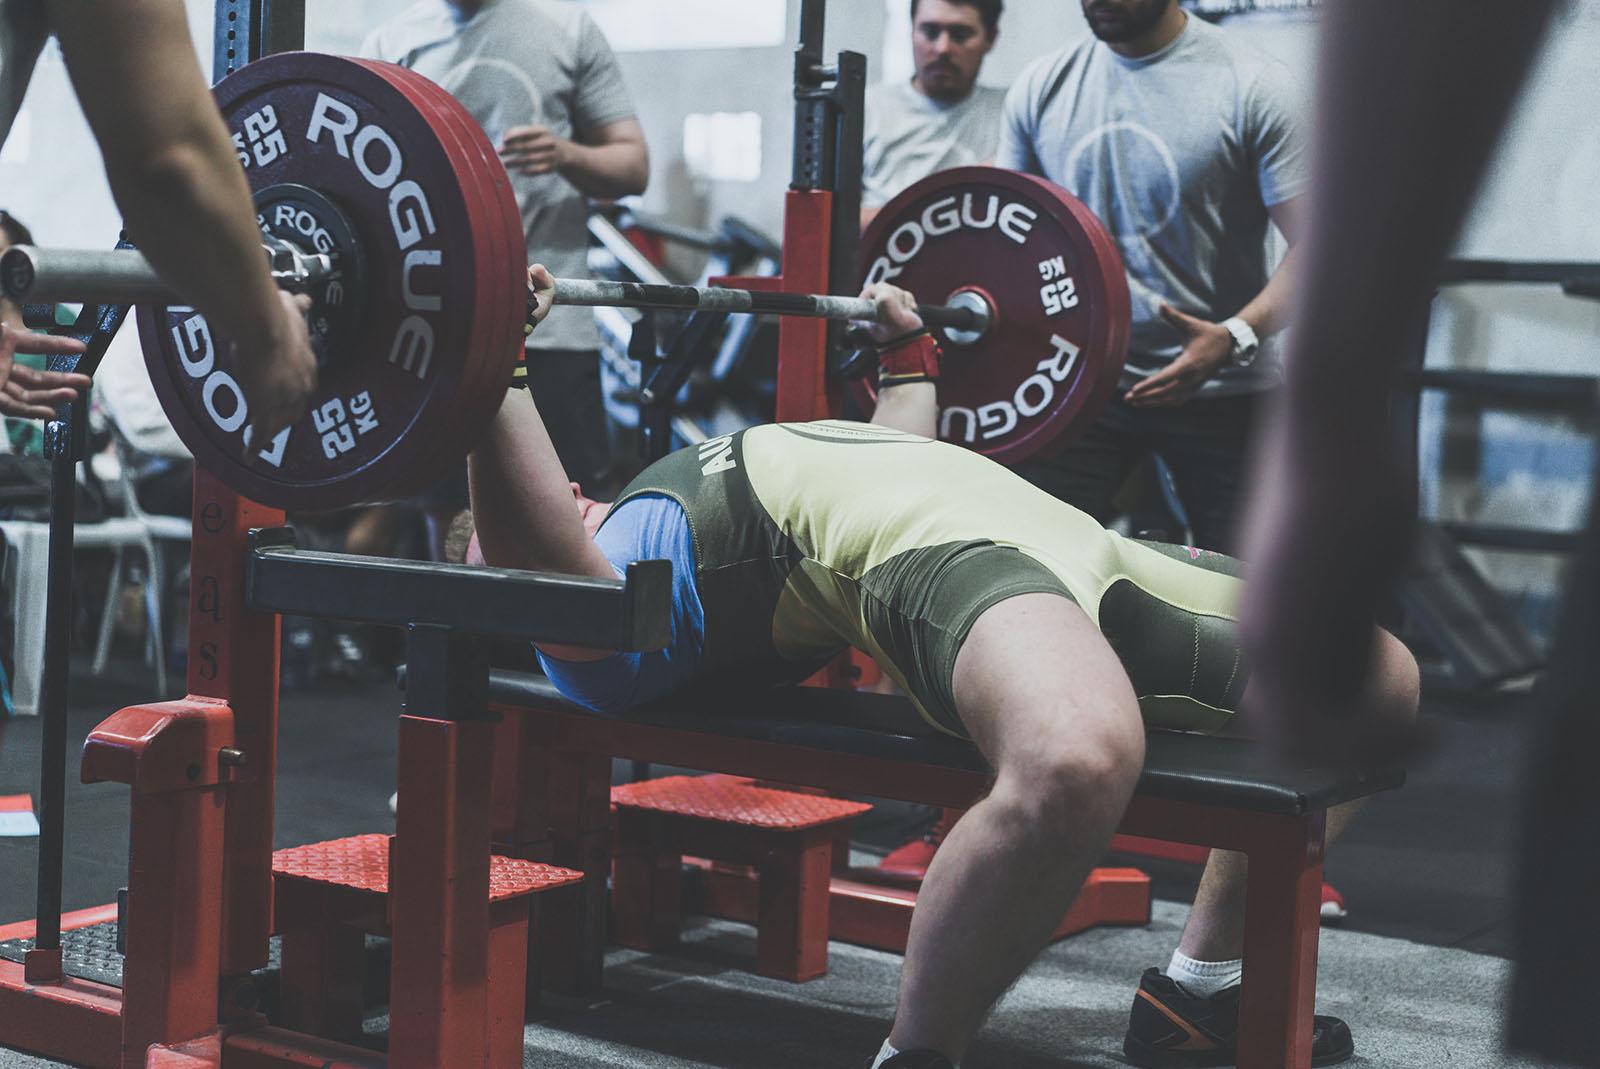 175kg bench press